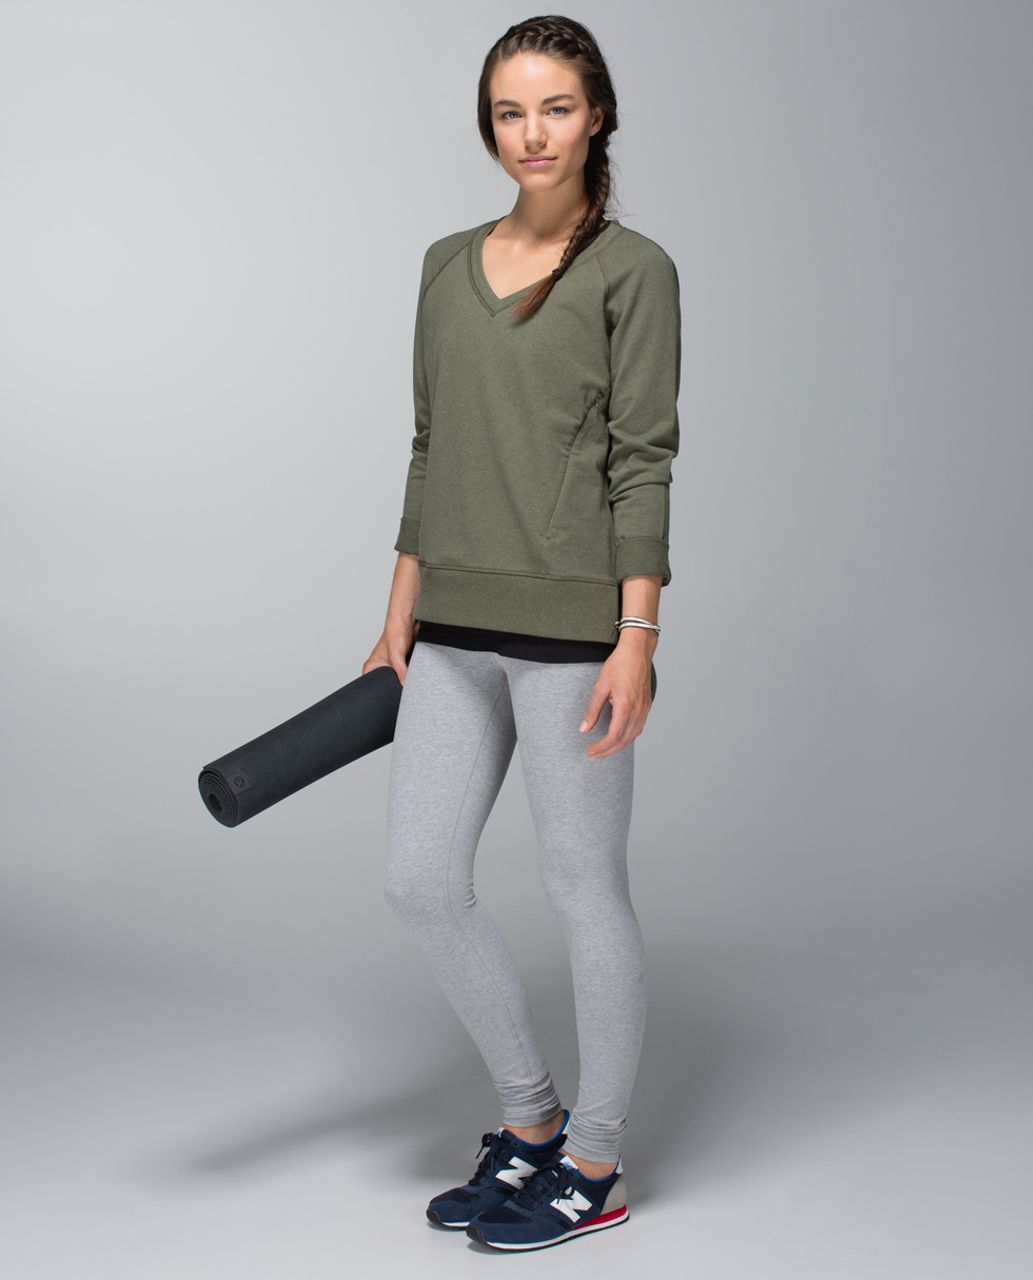 Lululemon Wunder Under Pant (Roll Down) *Cotton - Heathered Medium Grey